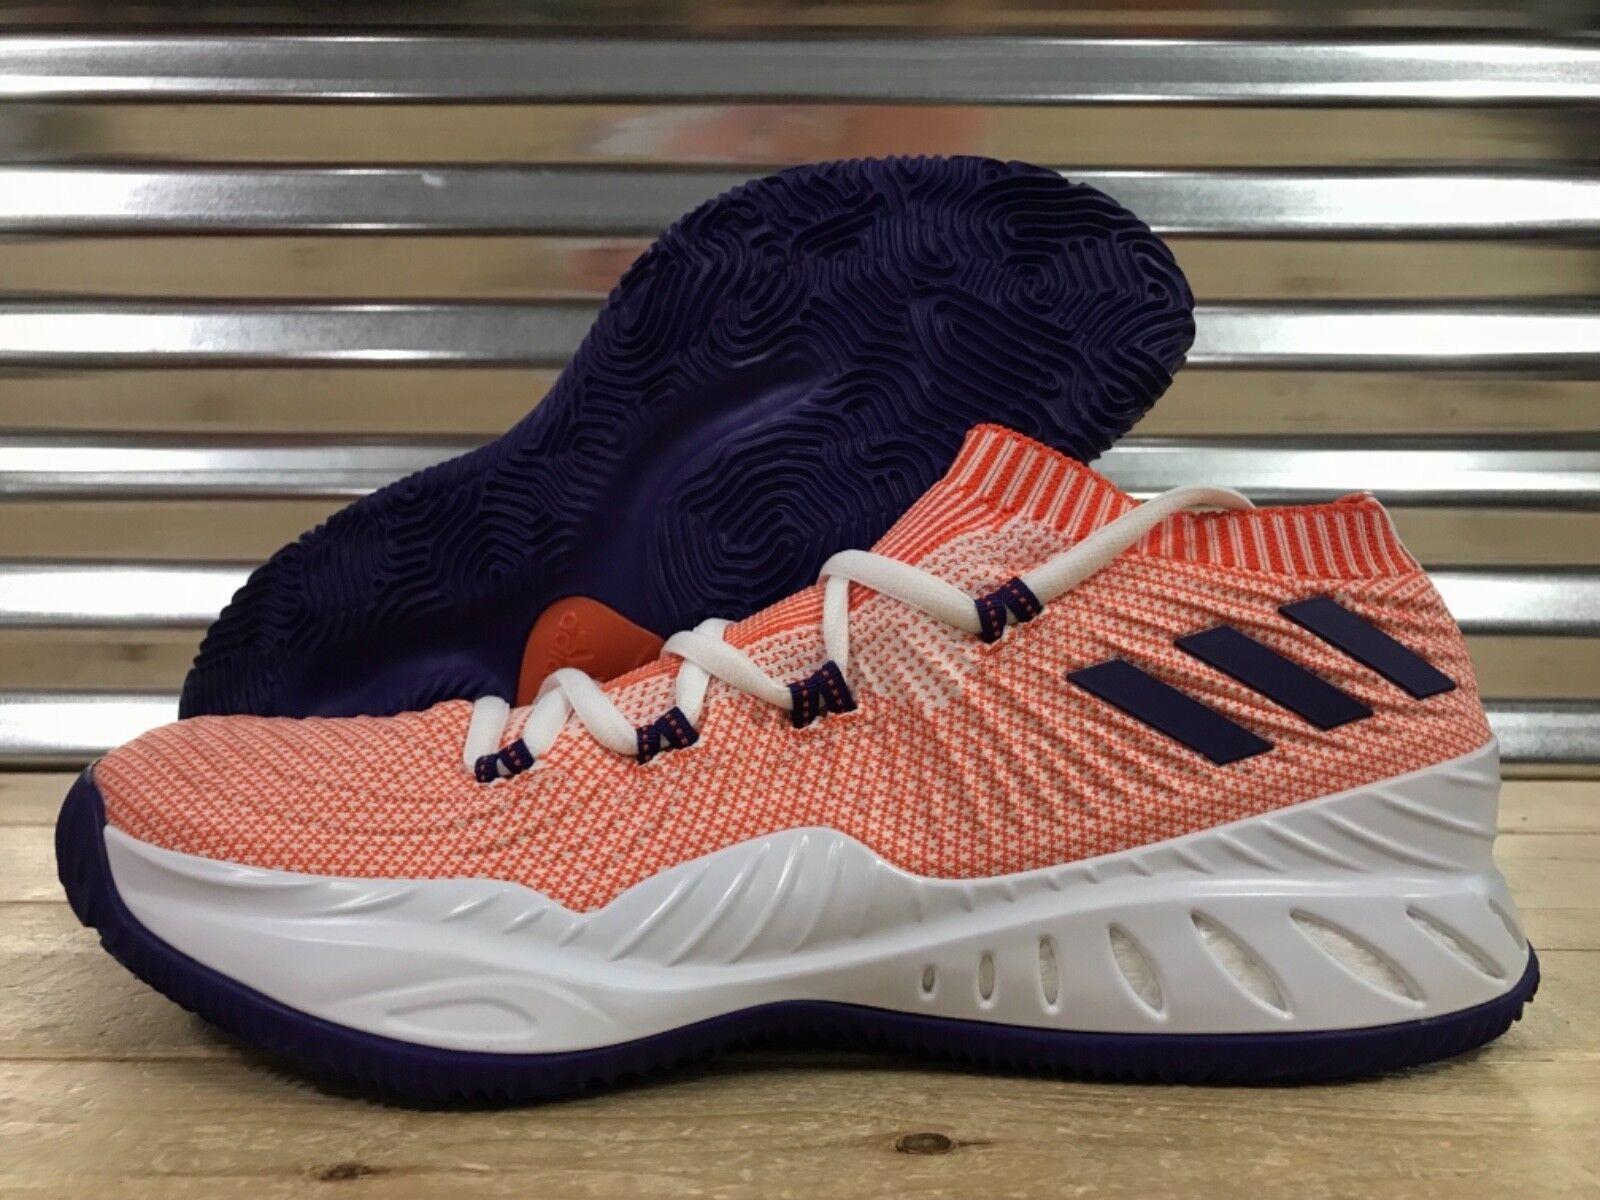 adidas fou explosif faible bender 2017 phoenix suns pe dragan bender faible Gris sz ah2270 d0c781